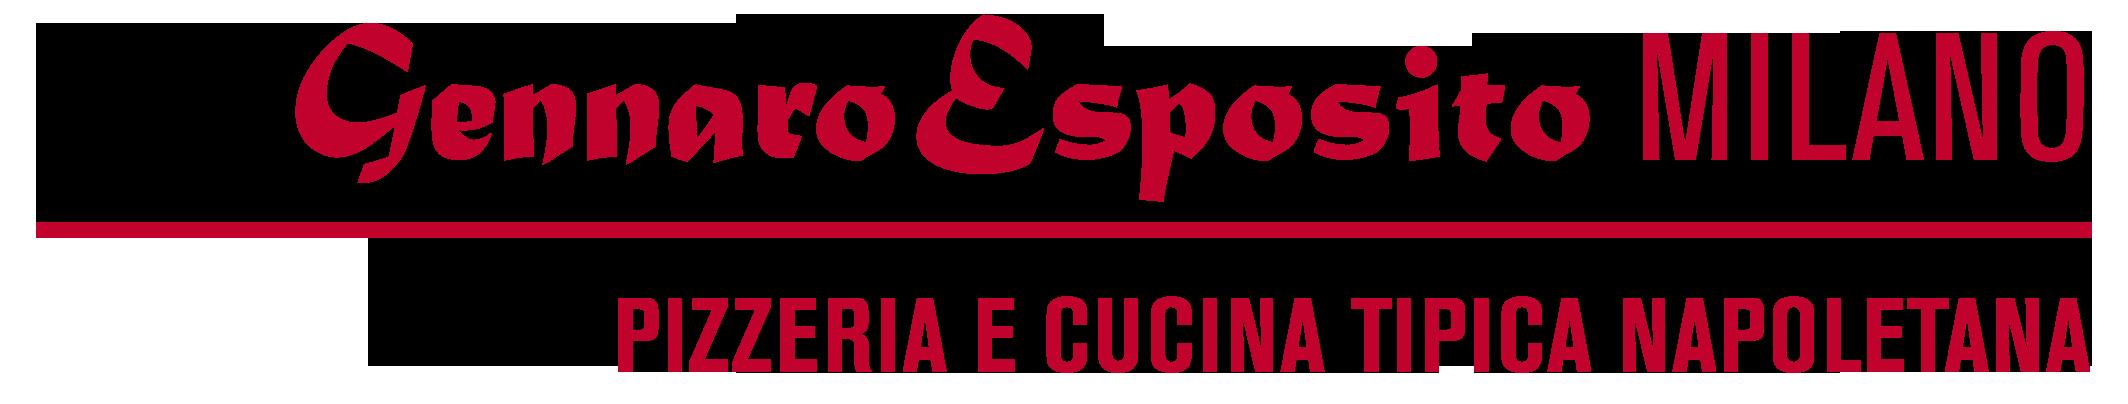 Gennaro Esposito Milano